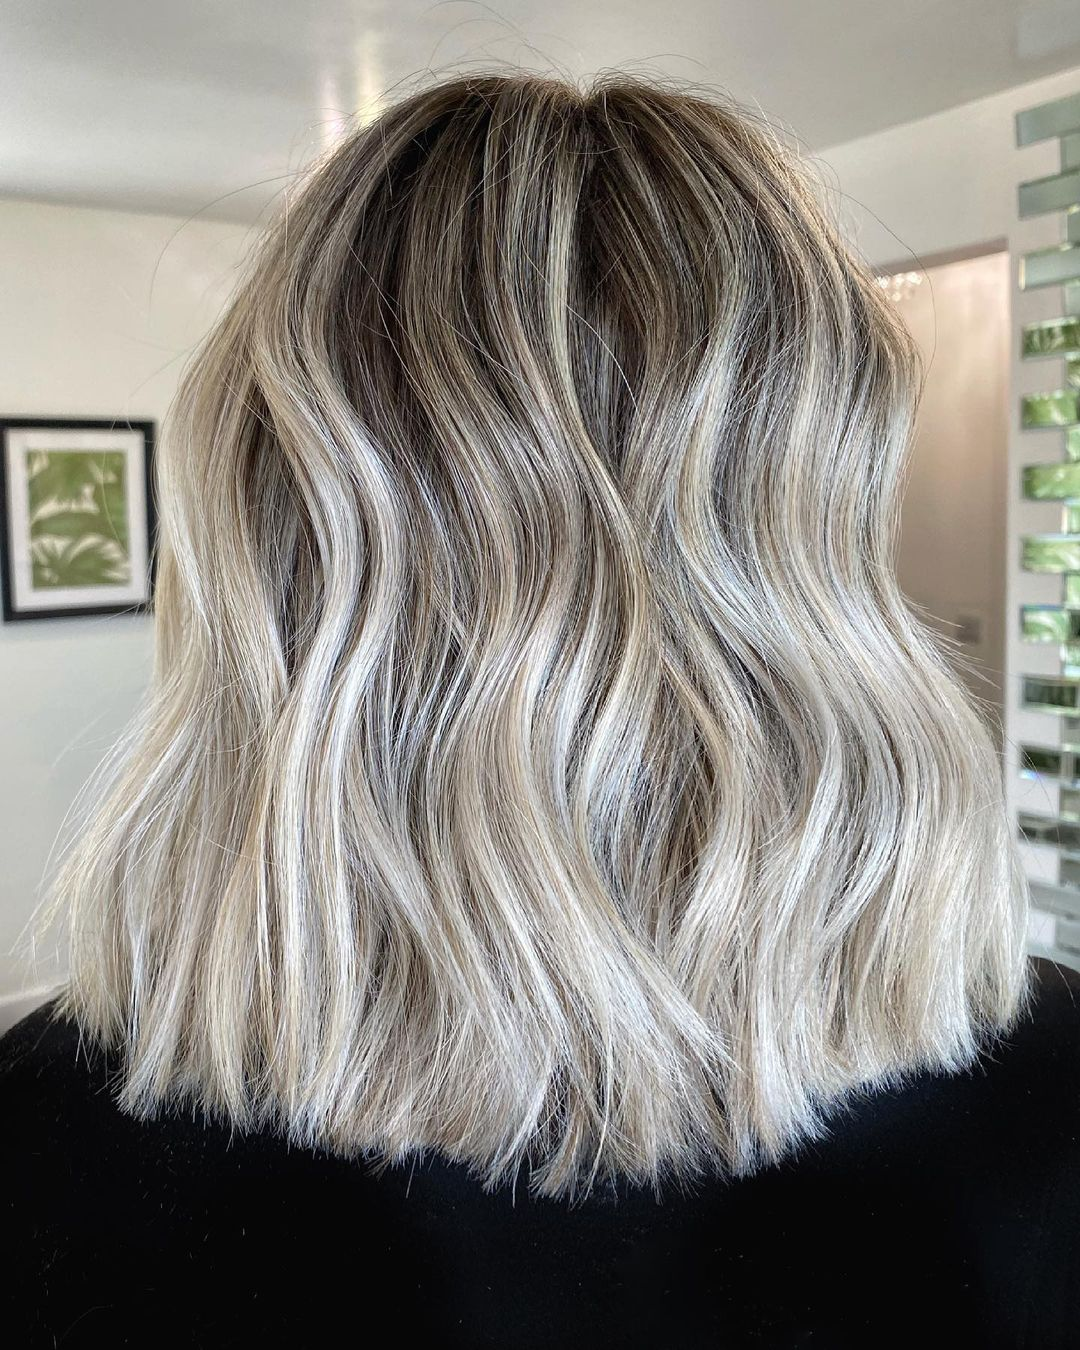 Low-Maintenance Silver Blonde Hair